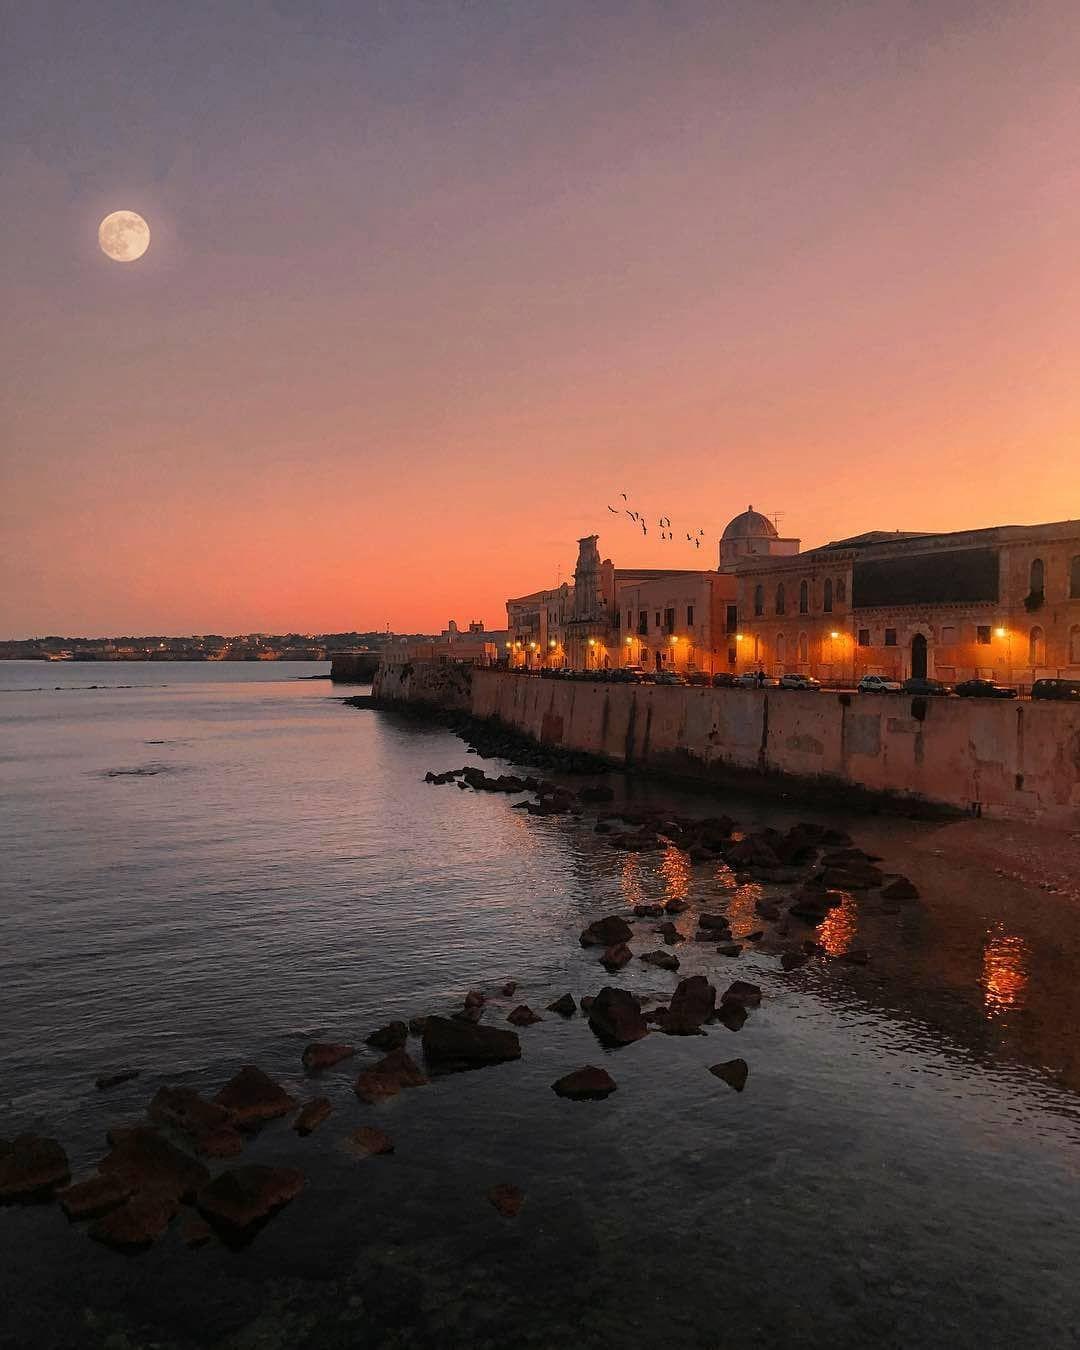 New The 10 Best Travel With Pictures Buonanotte Goodnight Buenas Noches Gute Nacht Lala Salama Usiku Mwema Beautiful Destinations Travel Europe Travel